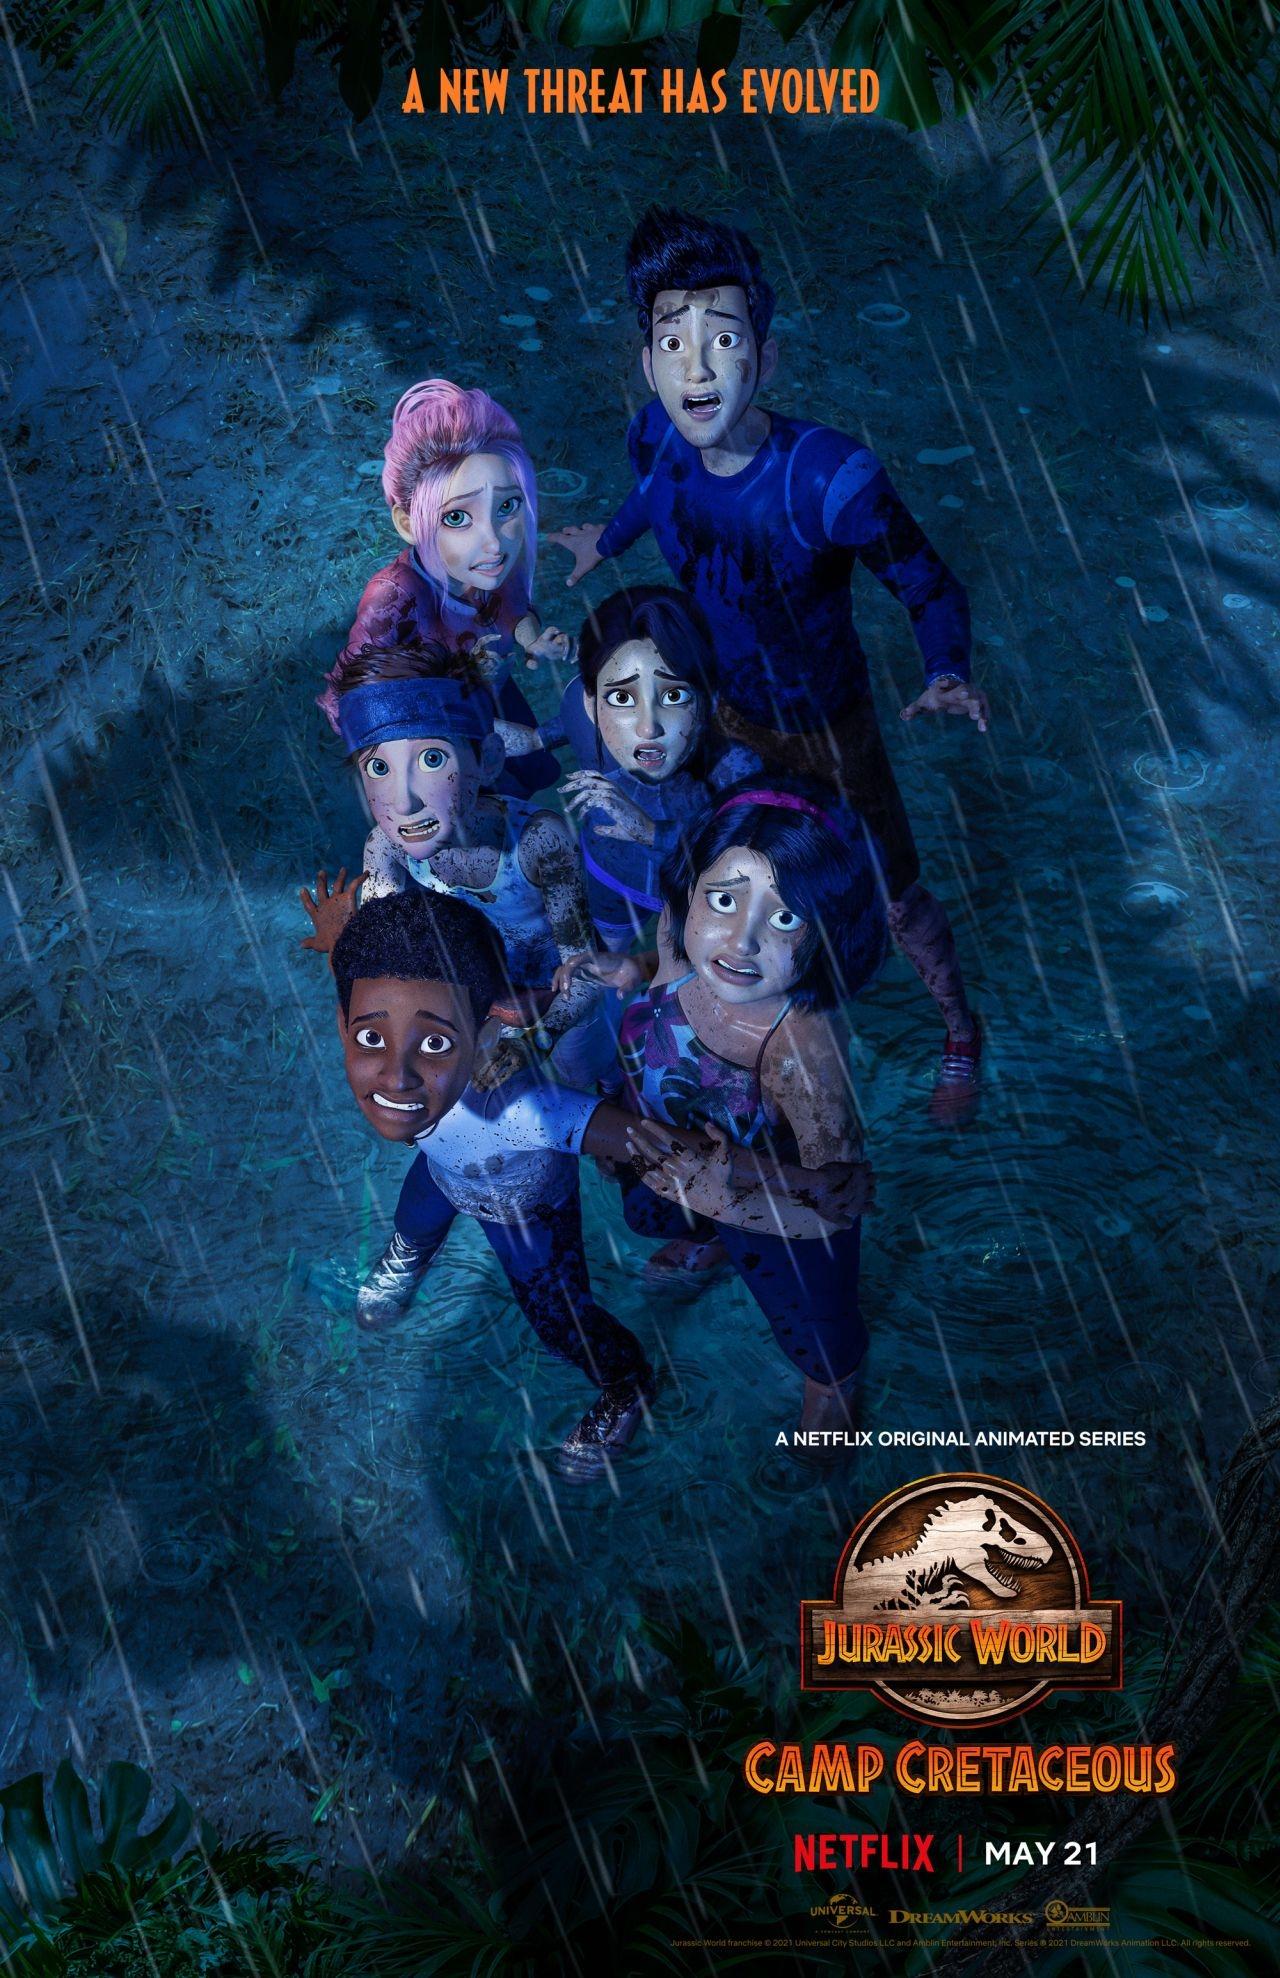 Jurassic World Camp Cretaceous Season 3 จูราสสิค เวิลด์ ค่ายครีเทเชียส ปี3 พากย์ไทย